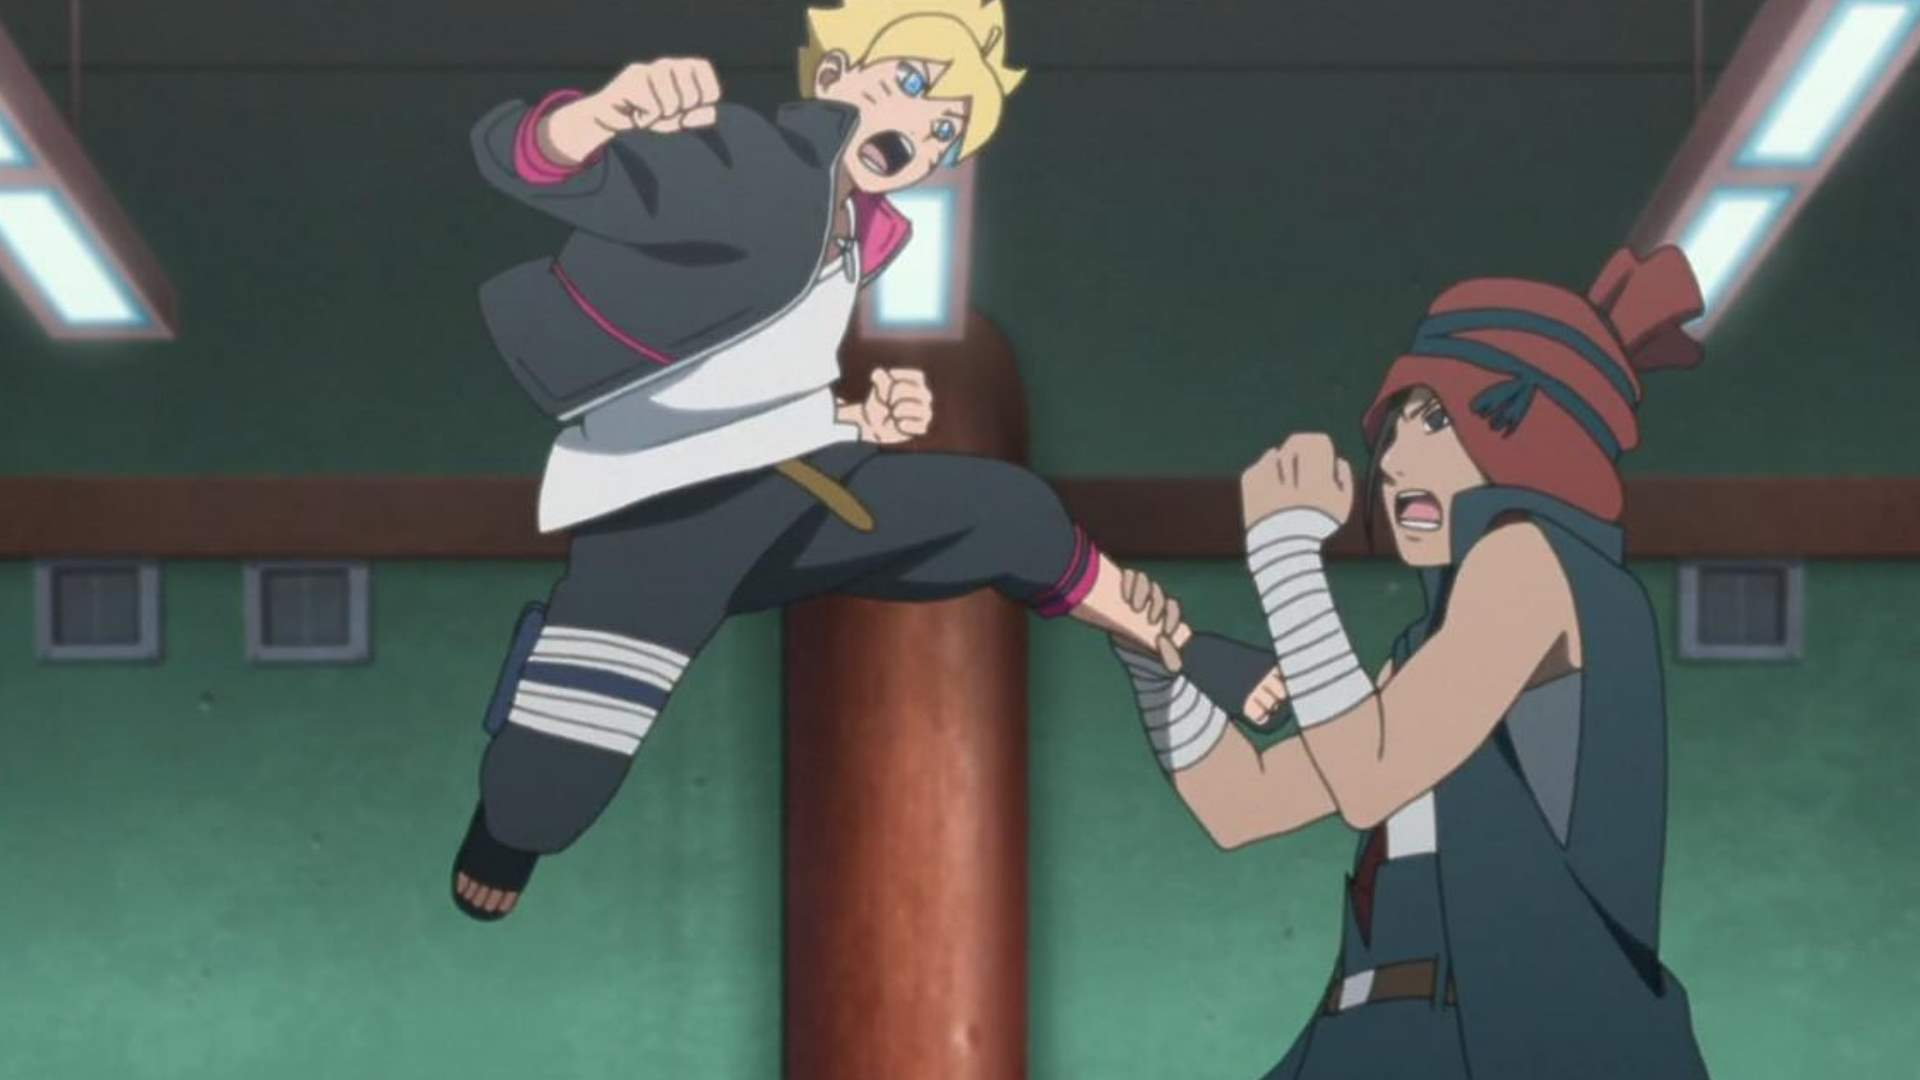 Boruto: Naruto Next Generations [Sub: Eng] - Season 1 - Watch Free